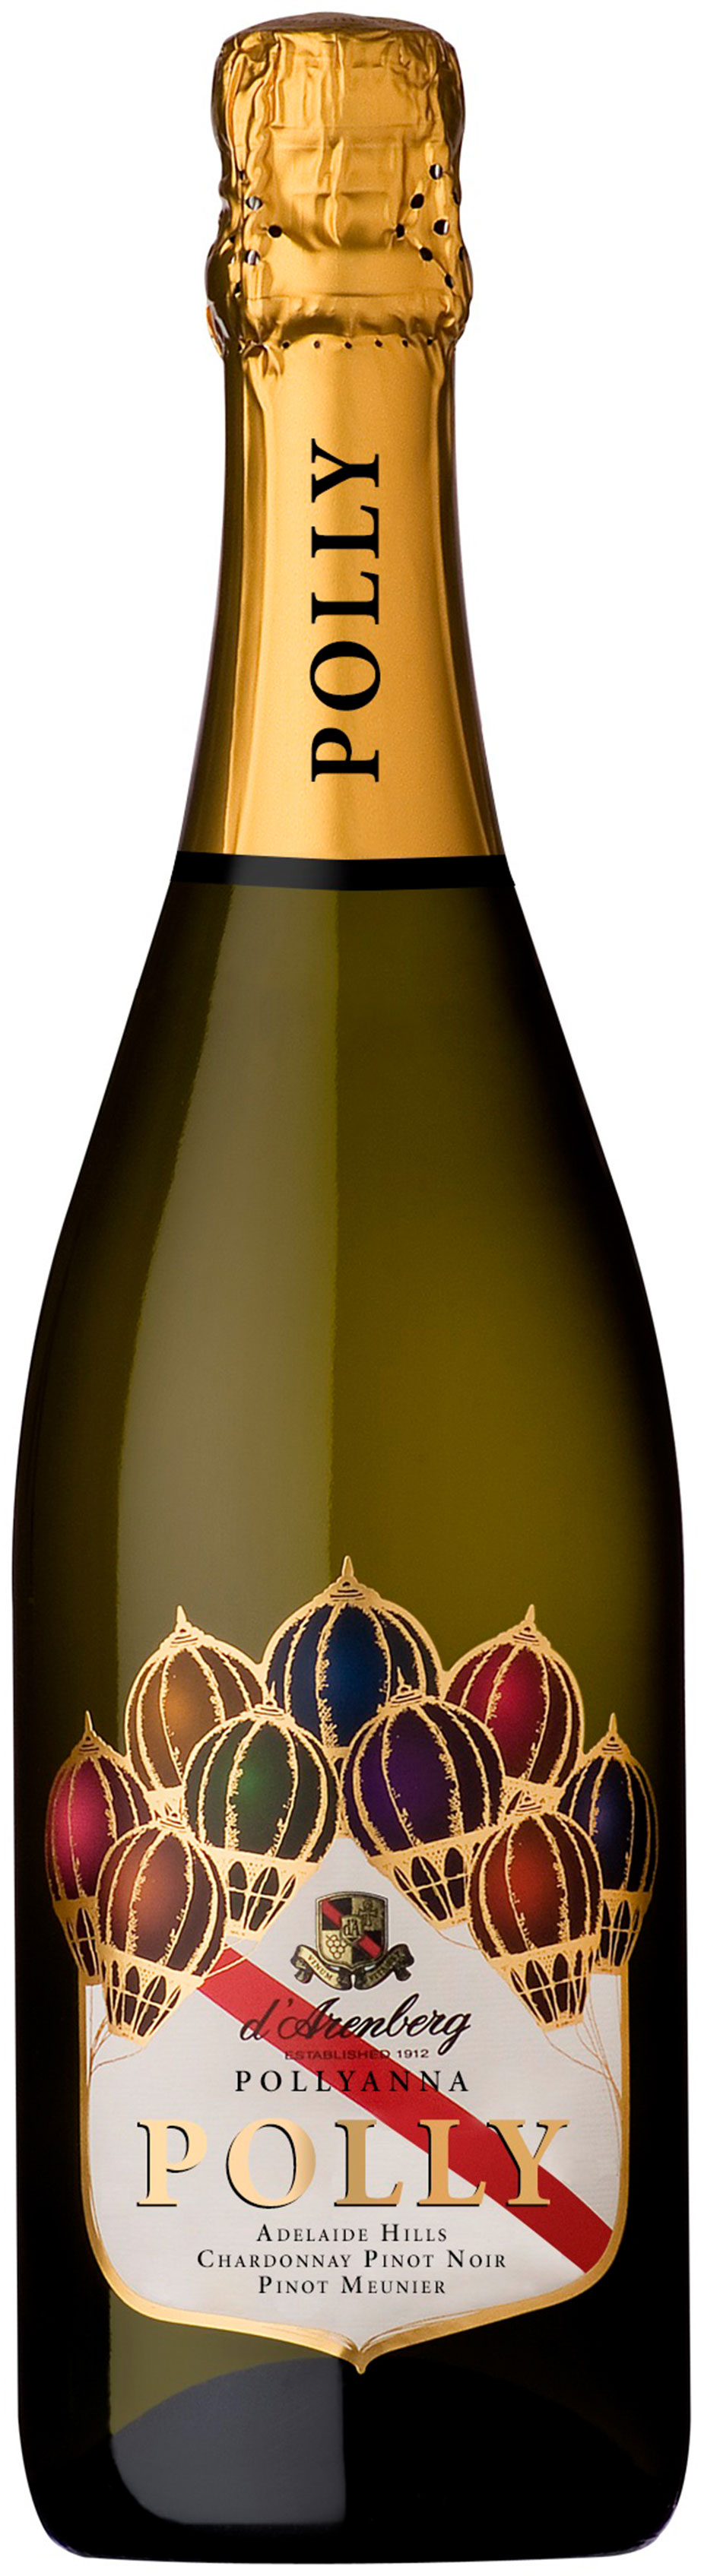 https://vinocorpperu.com/images/vinos/darenberg/pollyanna_polly_chardonnay_pinot_noir_meunier.jpg